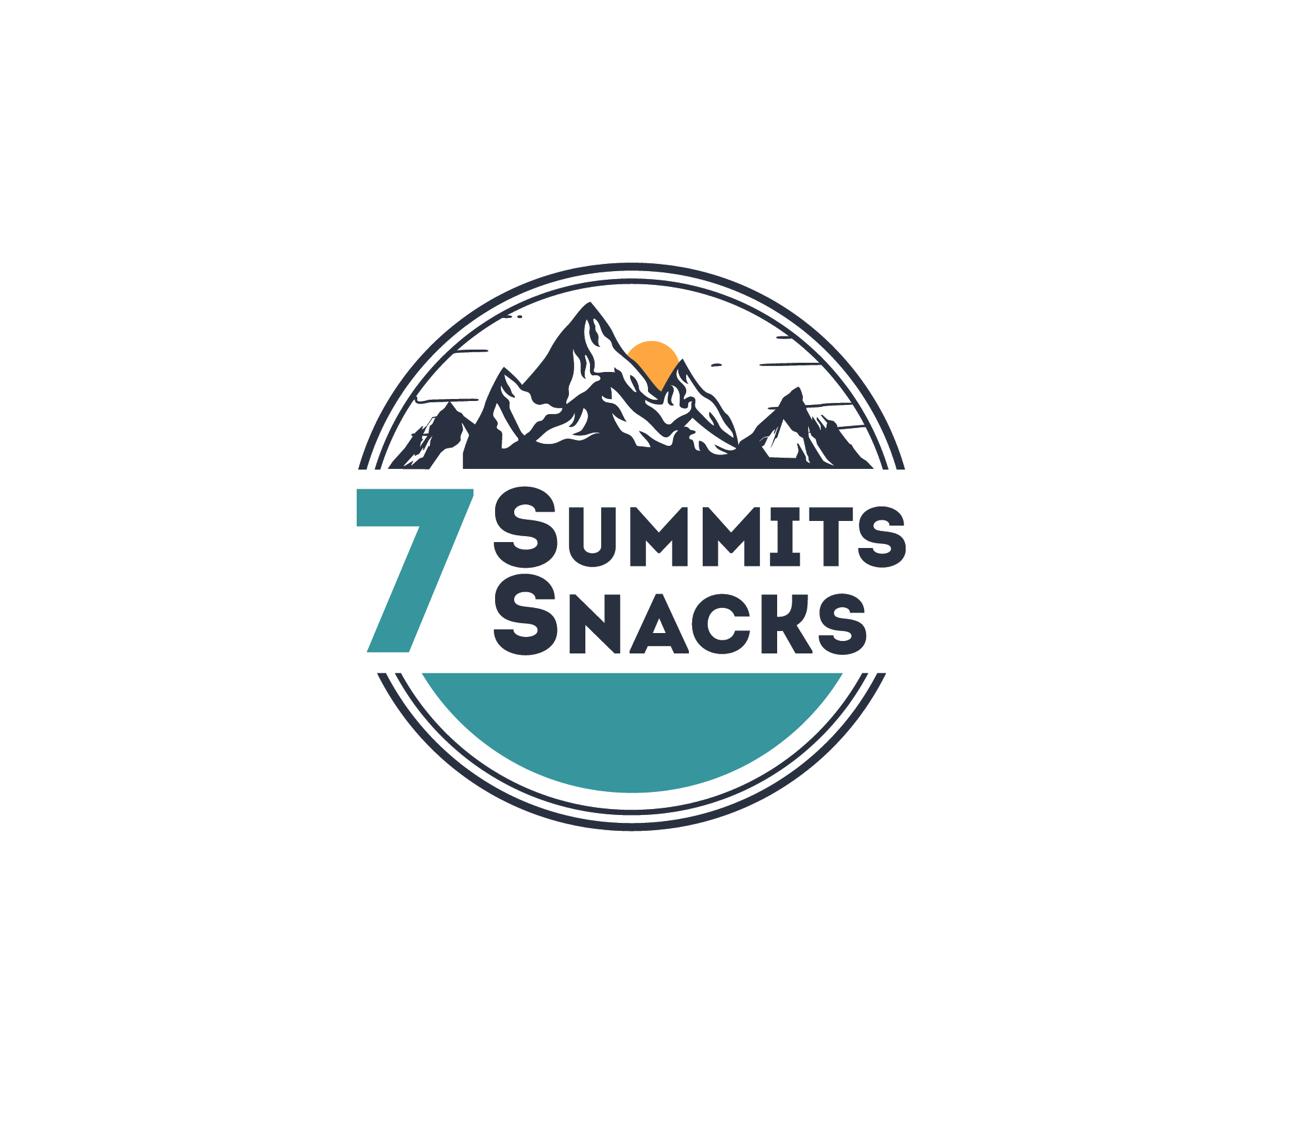 7 Summit Snacks